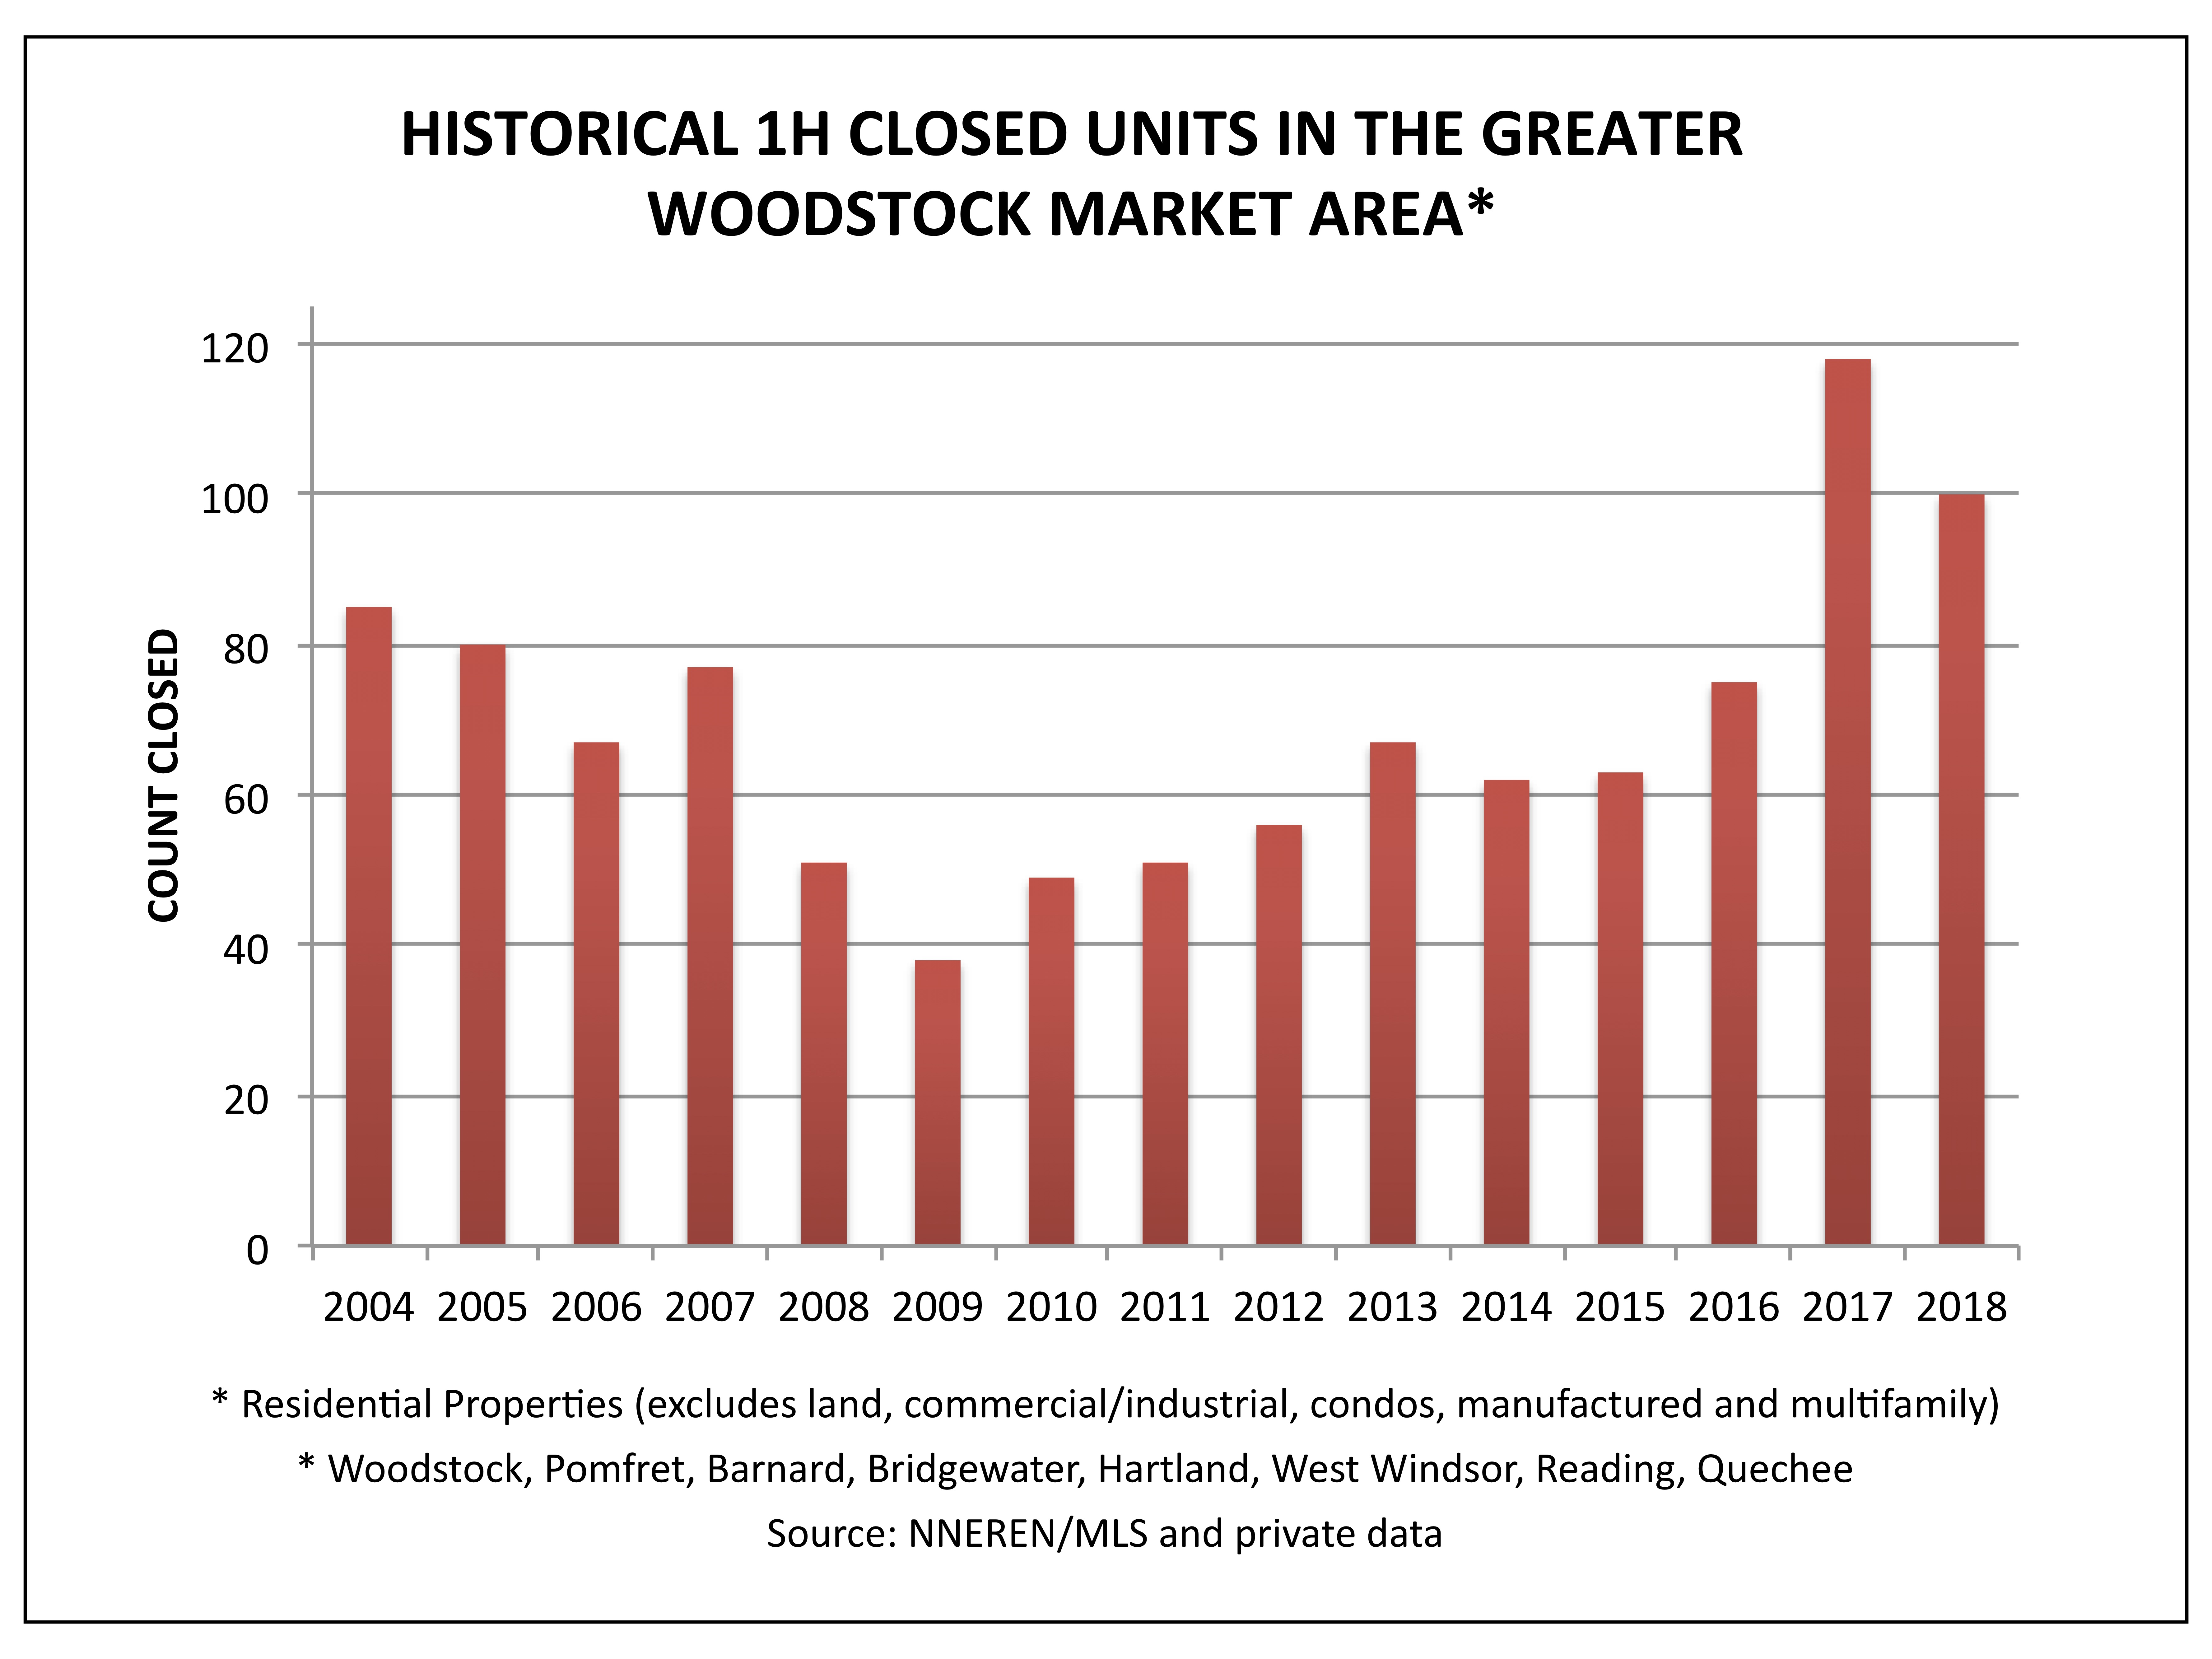 GWA Historical Closed